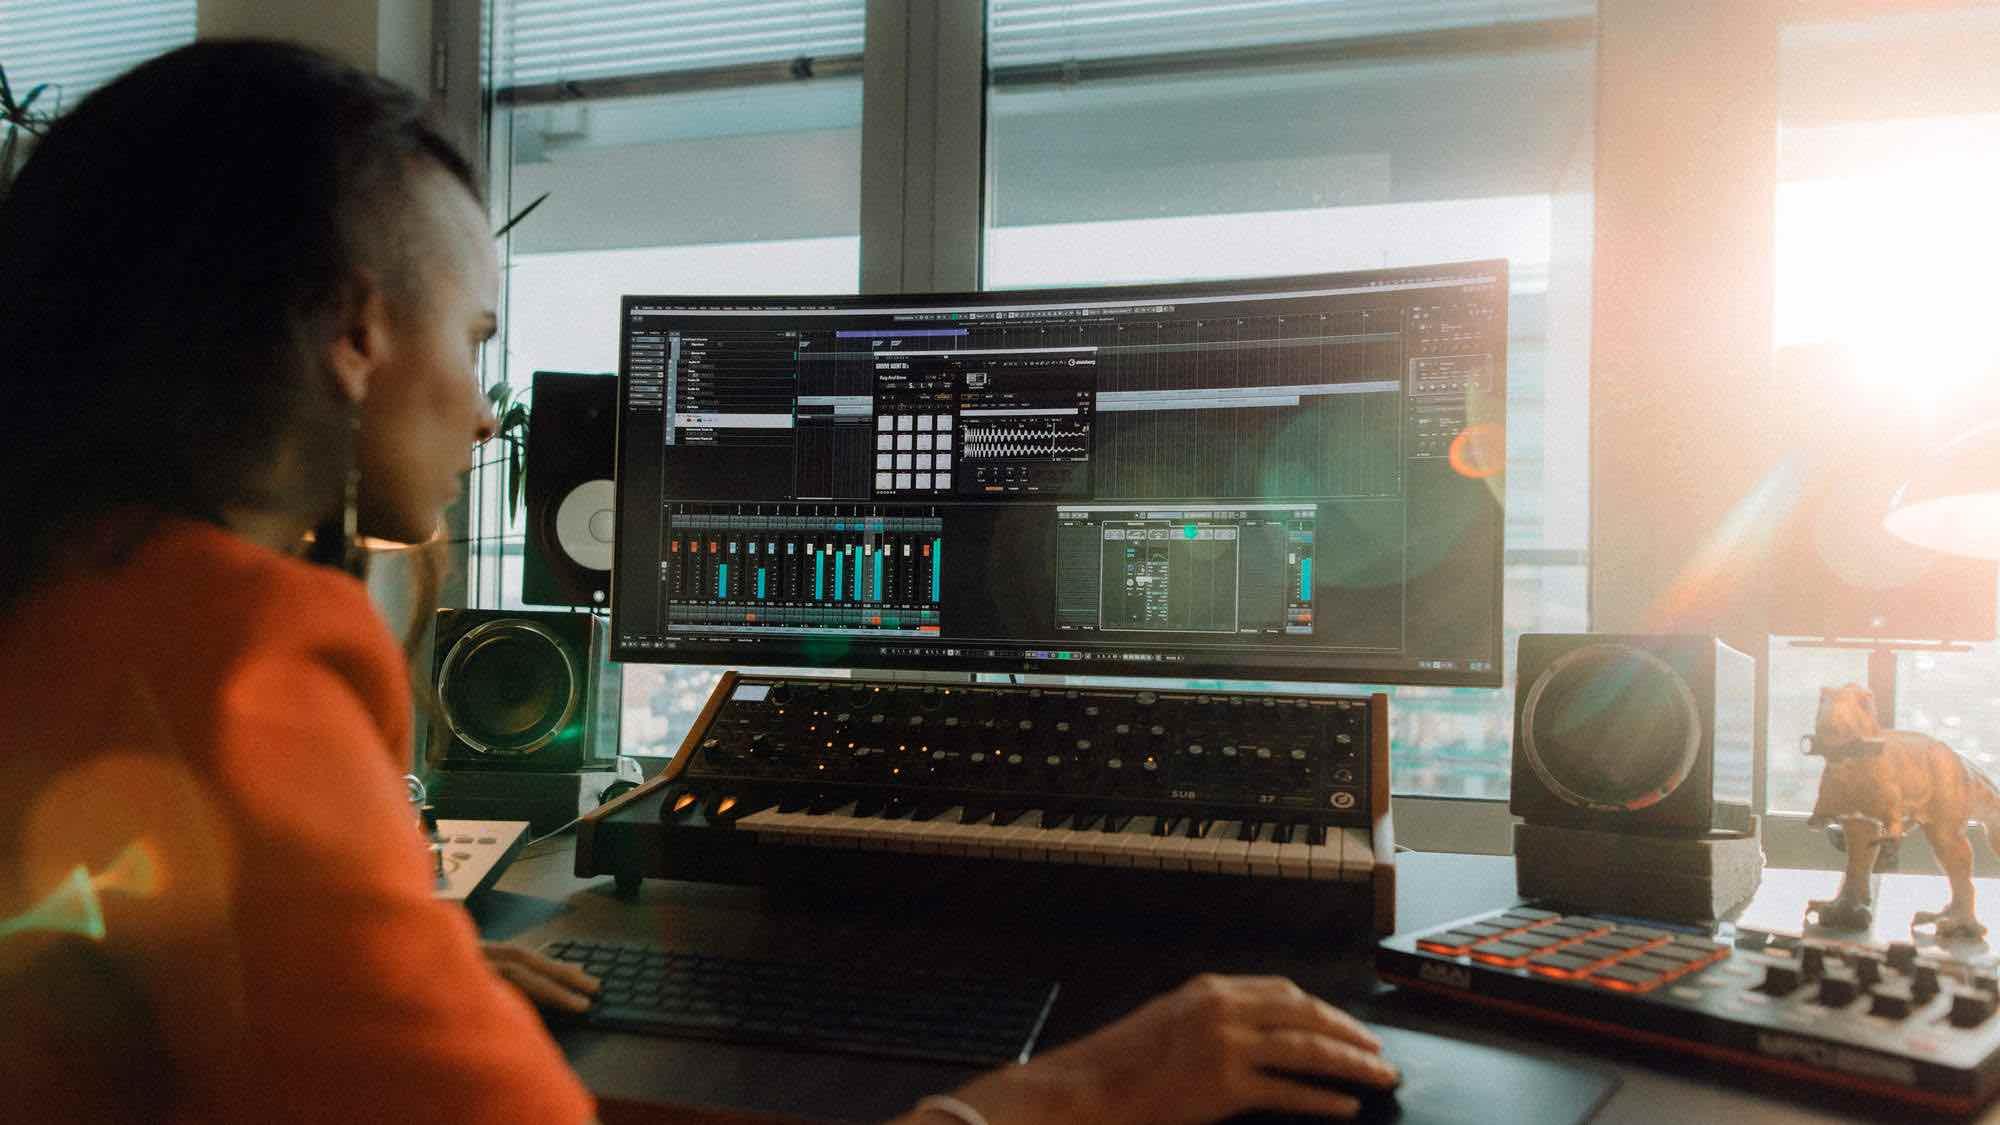 Steinberg #stayhome elements collection wavelab cubase dorico absolute daw software produzione strumenti musicali